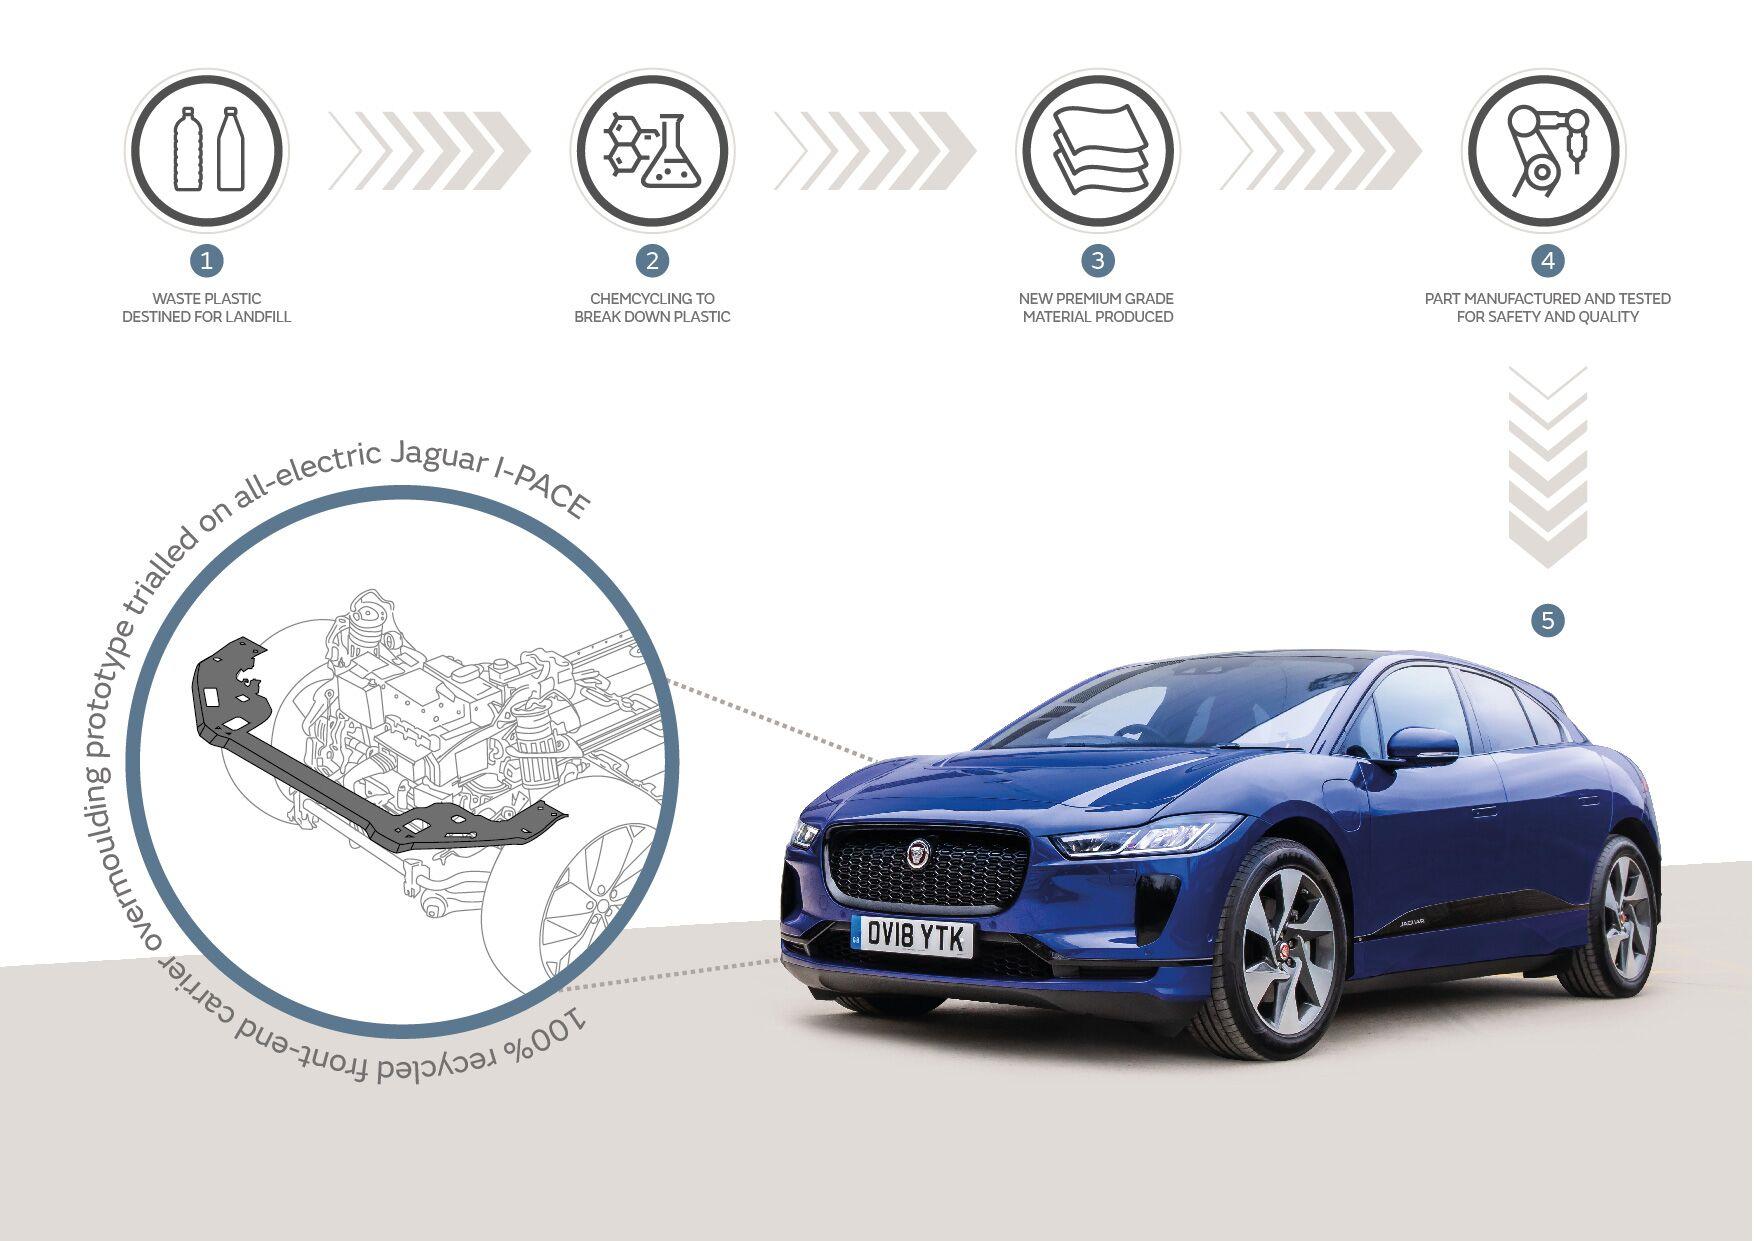 Jaguar Land Rover Trials Innovative Plastic Recycling